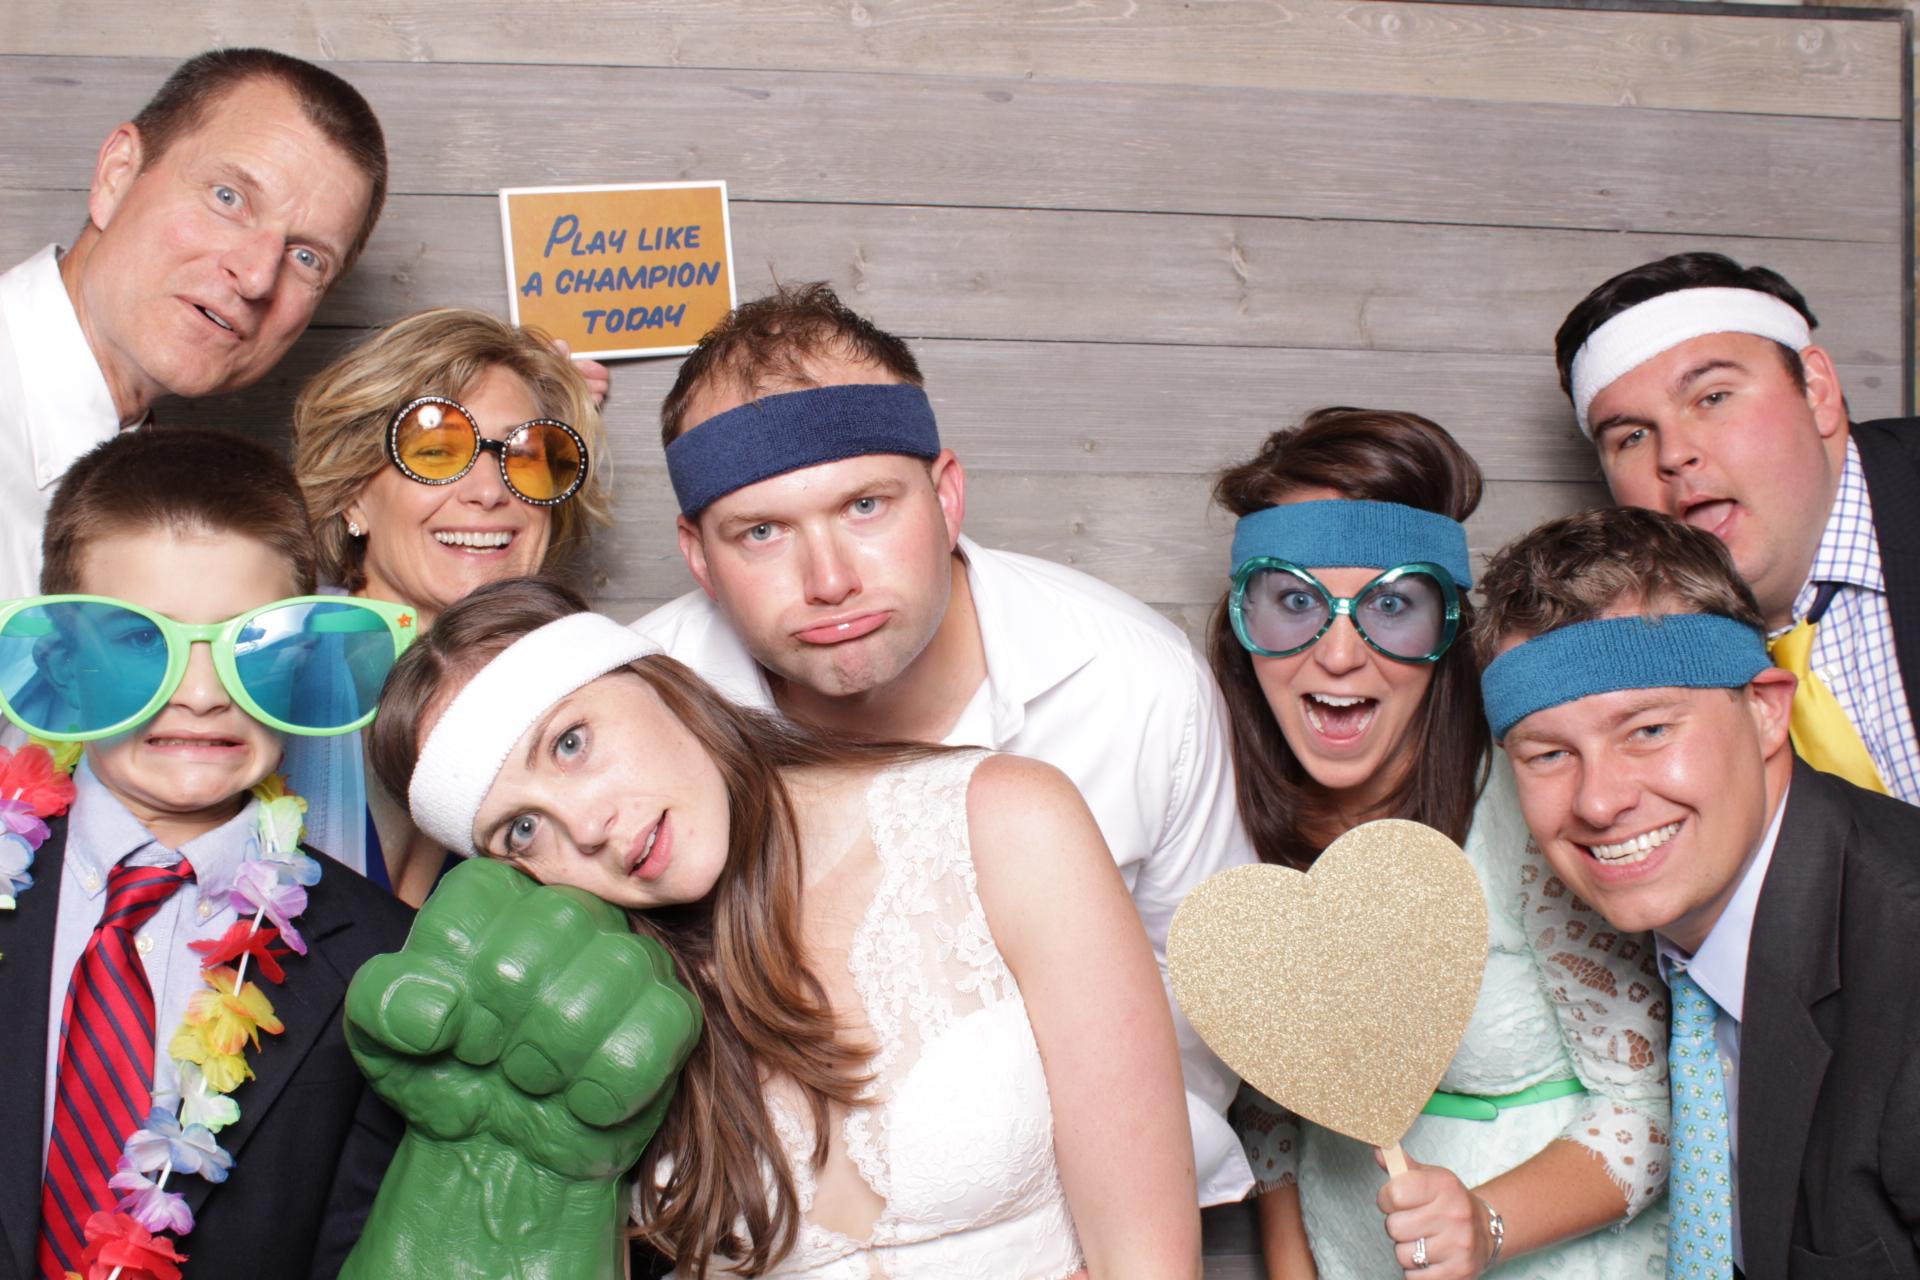 Minneapolis_Machine_Shop_wedding_photo_booth_rental.jpg